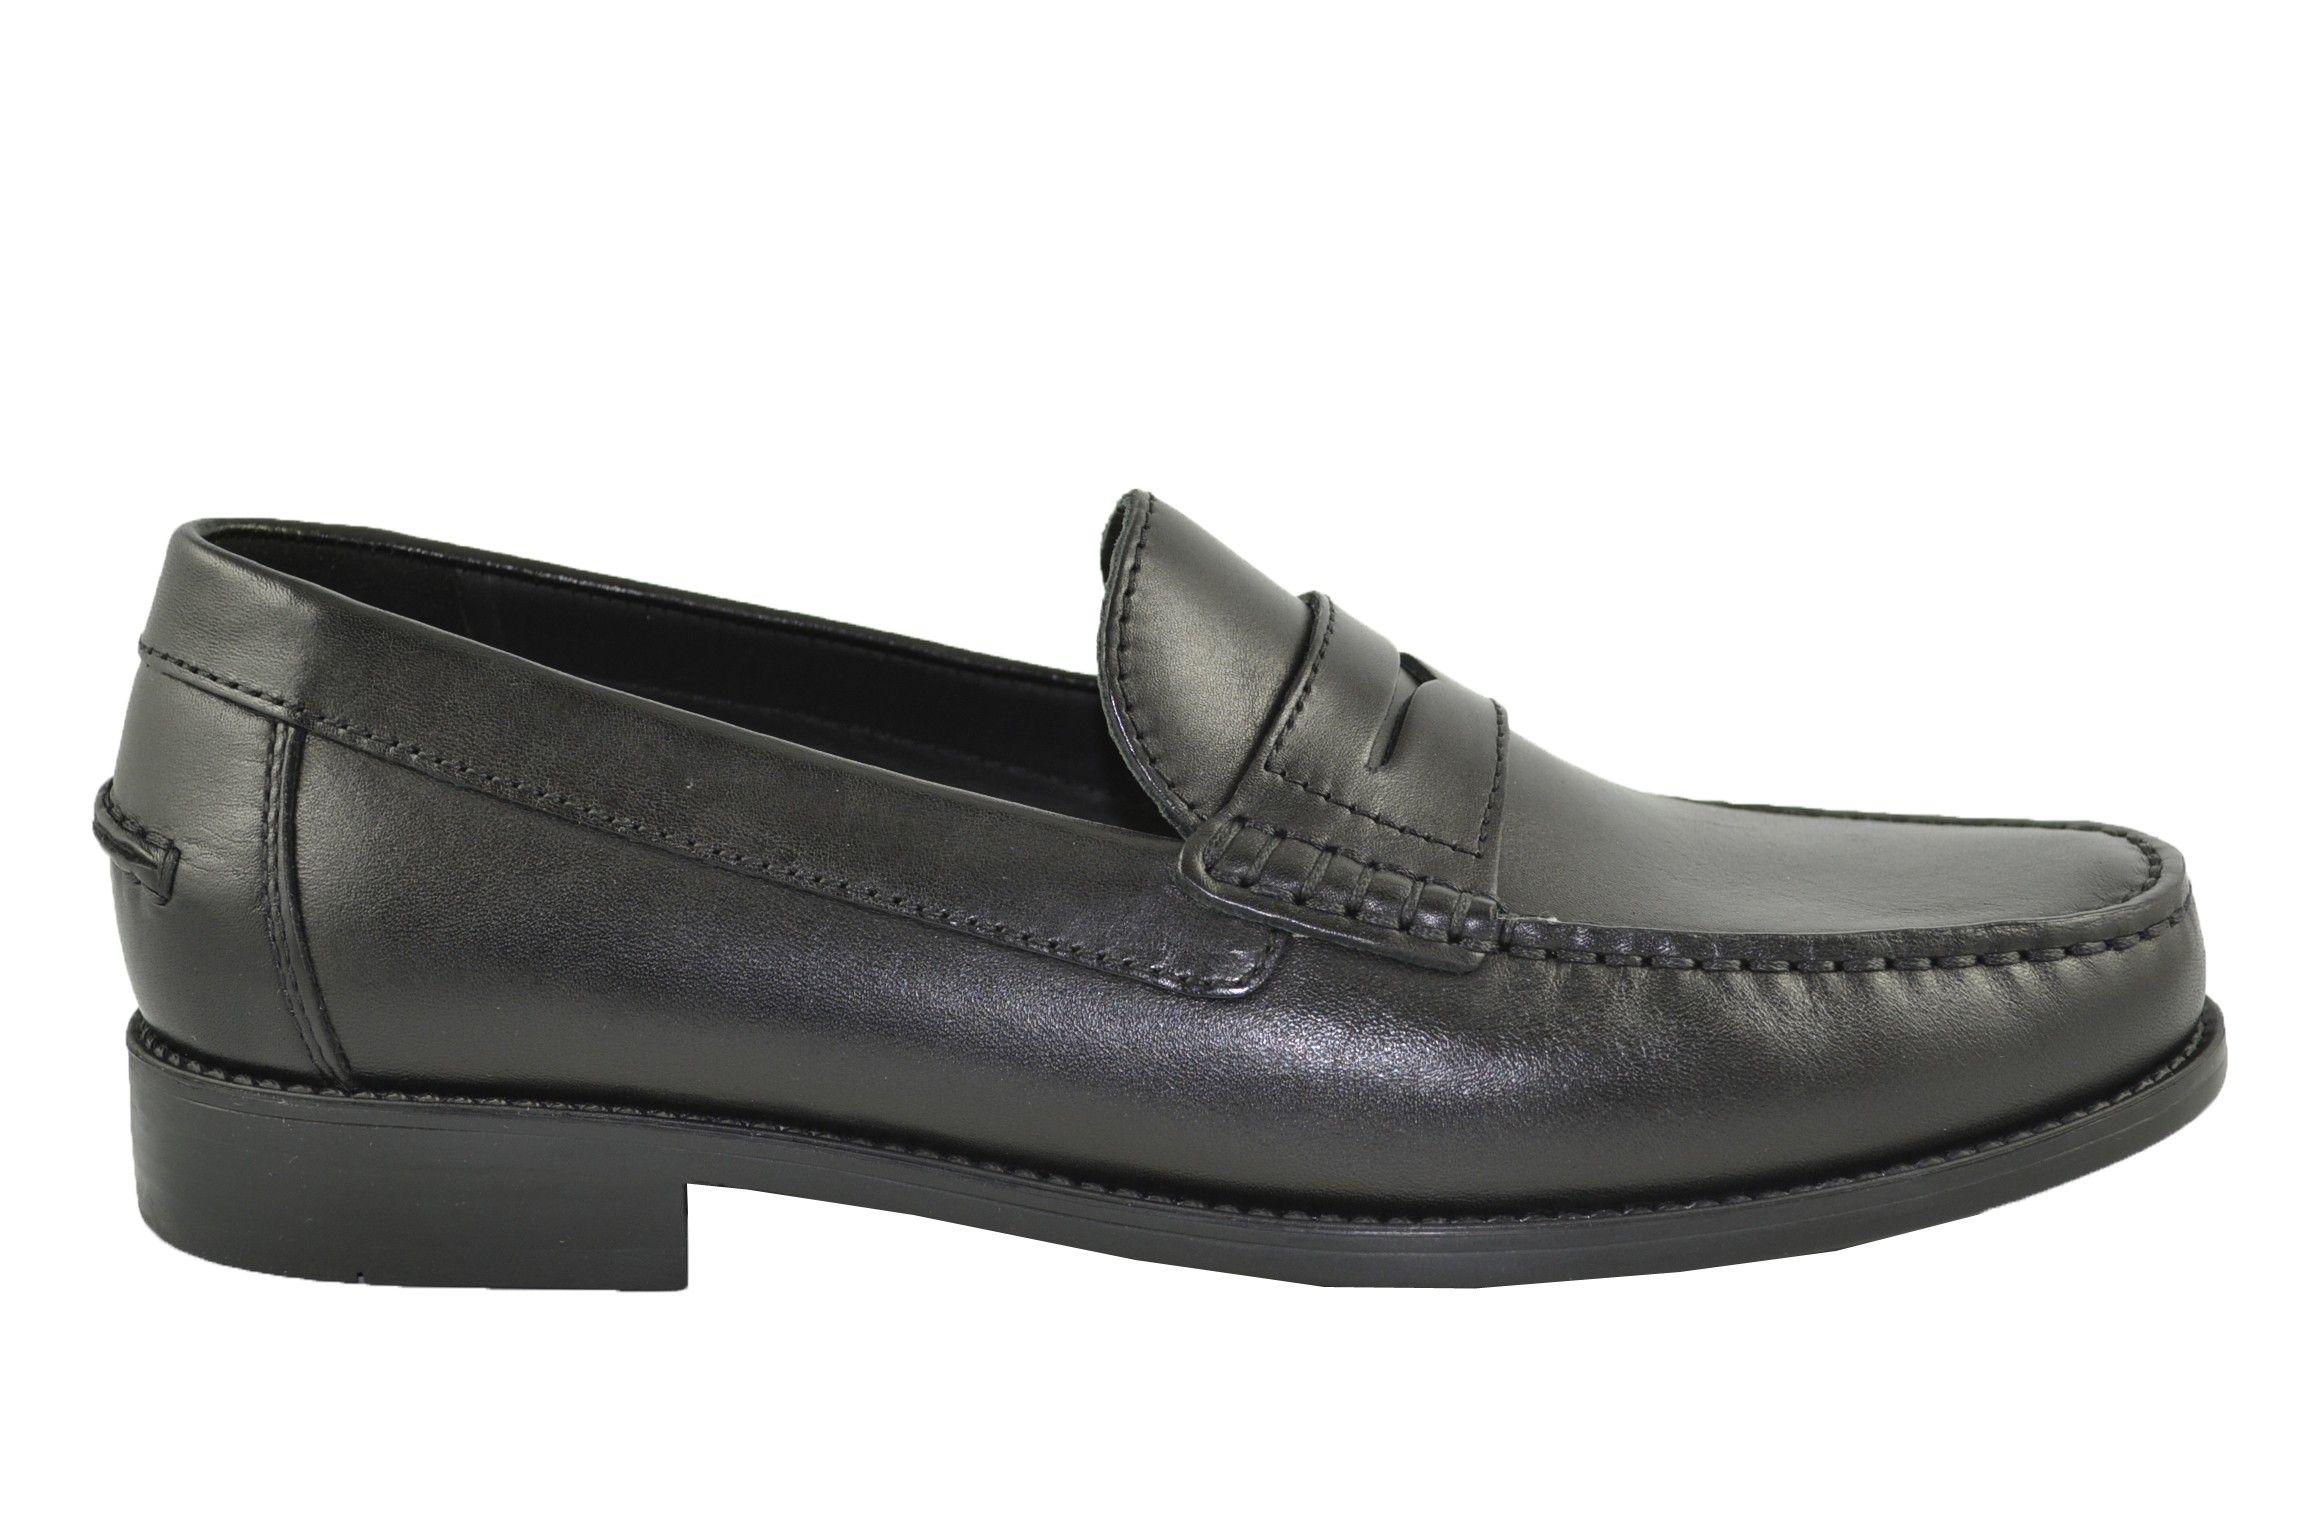 zapatos negros de de negros primavera formales Geox para mujer 41 EU Boxfresh 3710b2